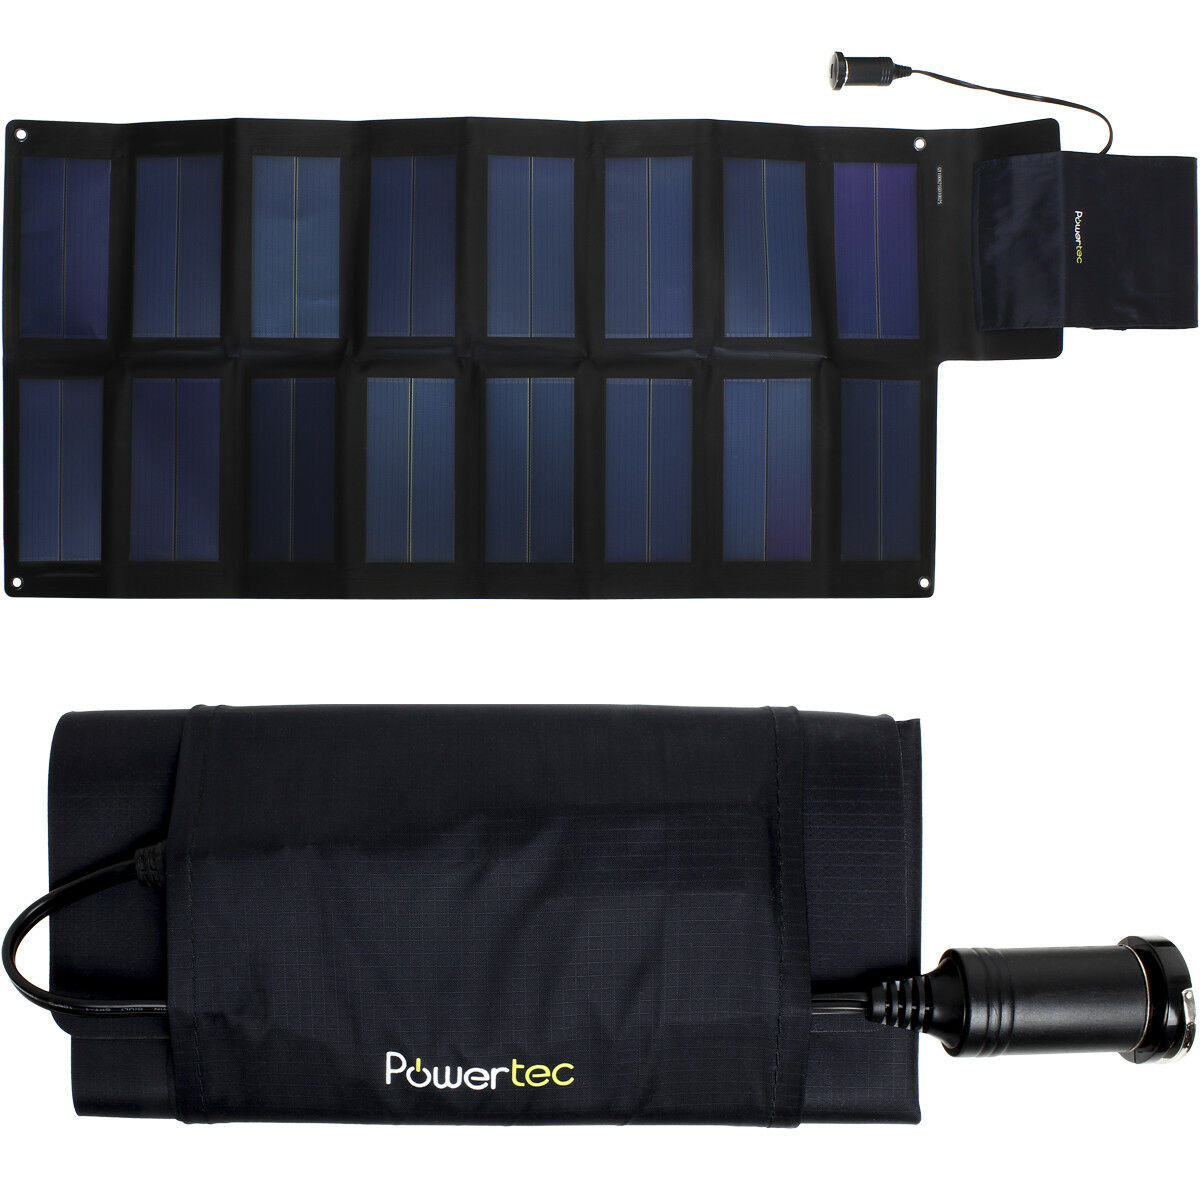 PowerTec PT25 25W Waterproof Folding Flexible Solar Panel with USB Adaptor Lead.